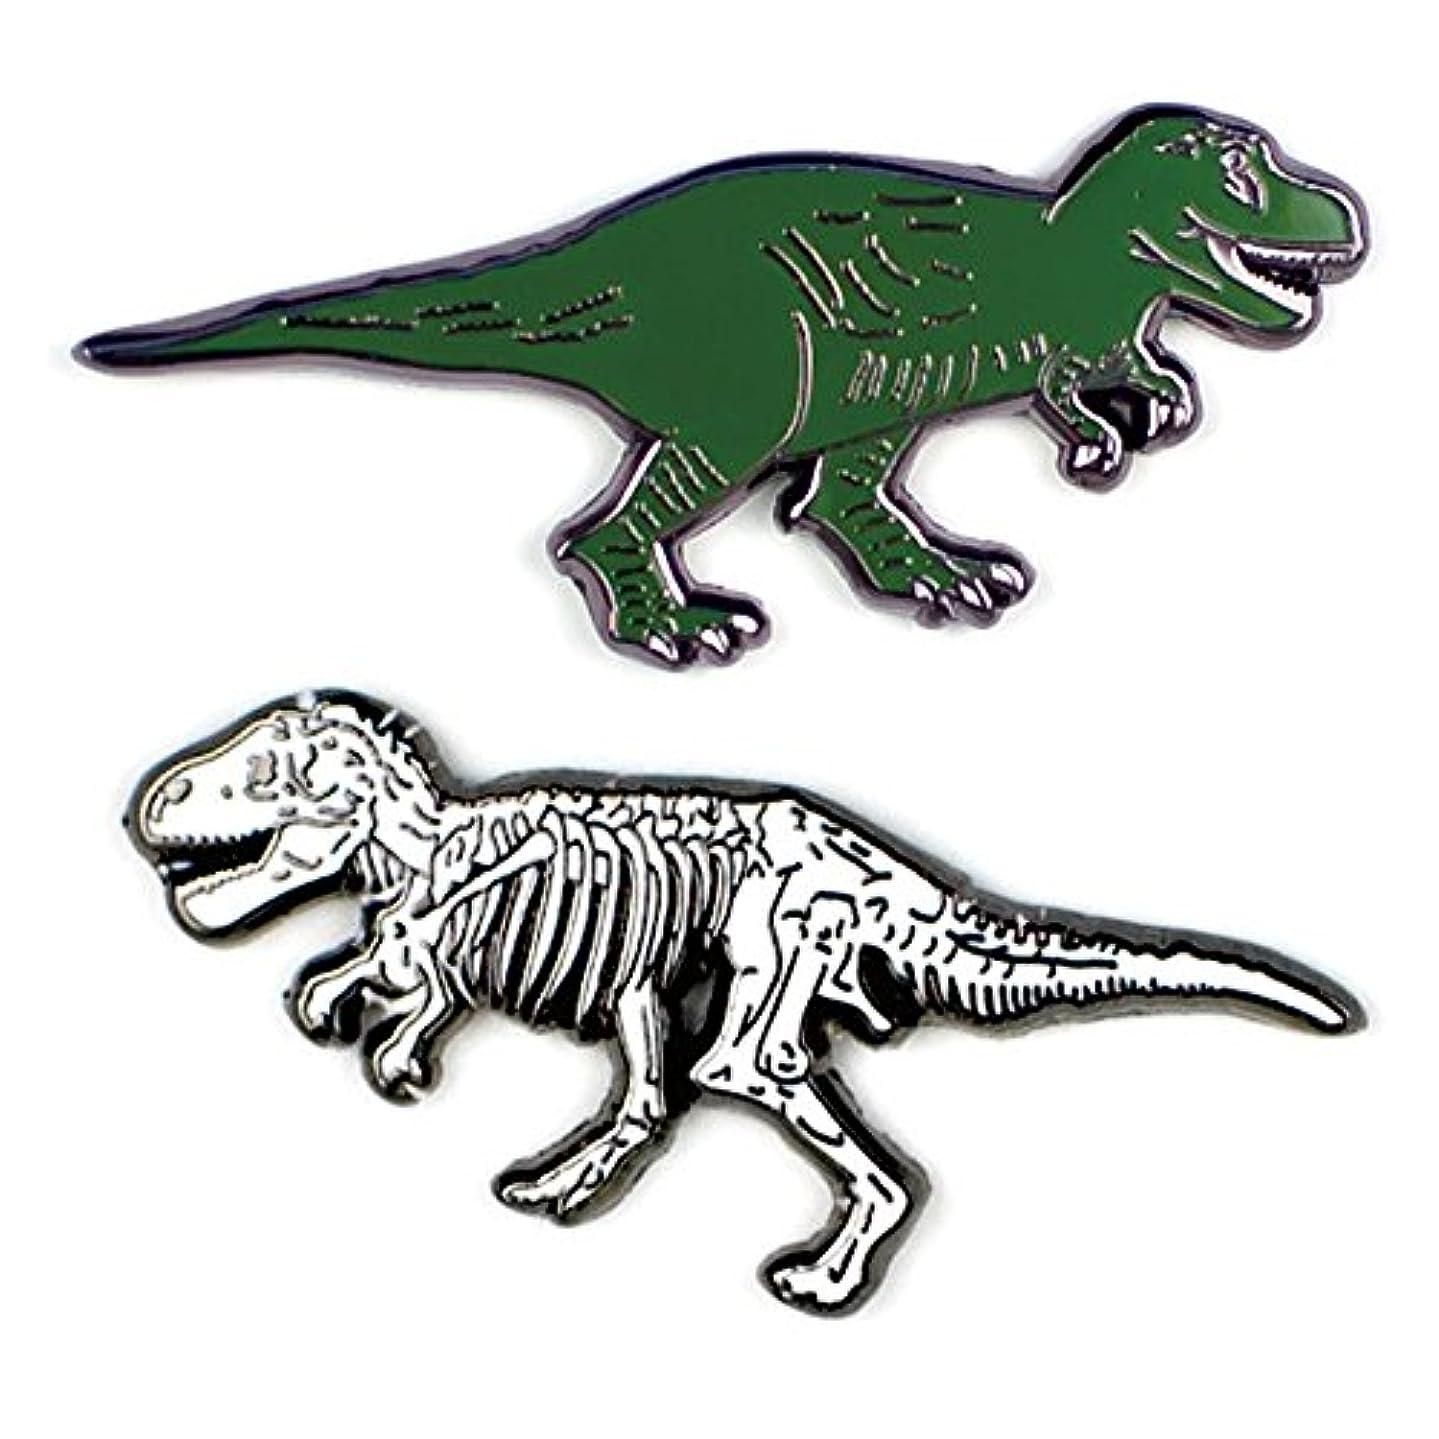 The Unemployed Philosophers Guild T. Rex and Fossil Enamel Pin Set - 2 Unique Colored Metal Lapel Pins